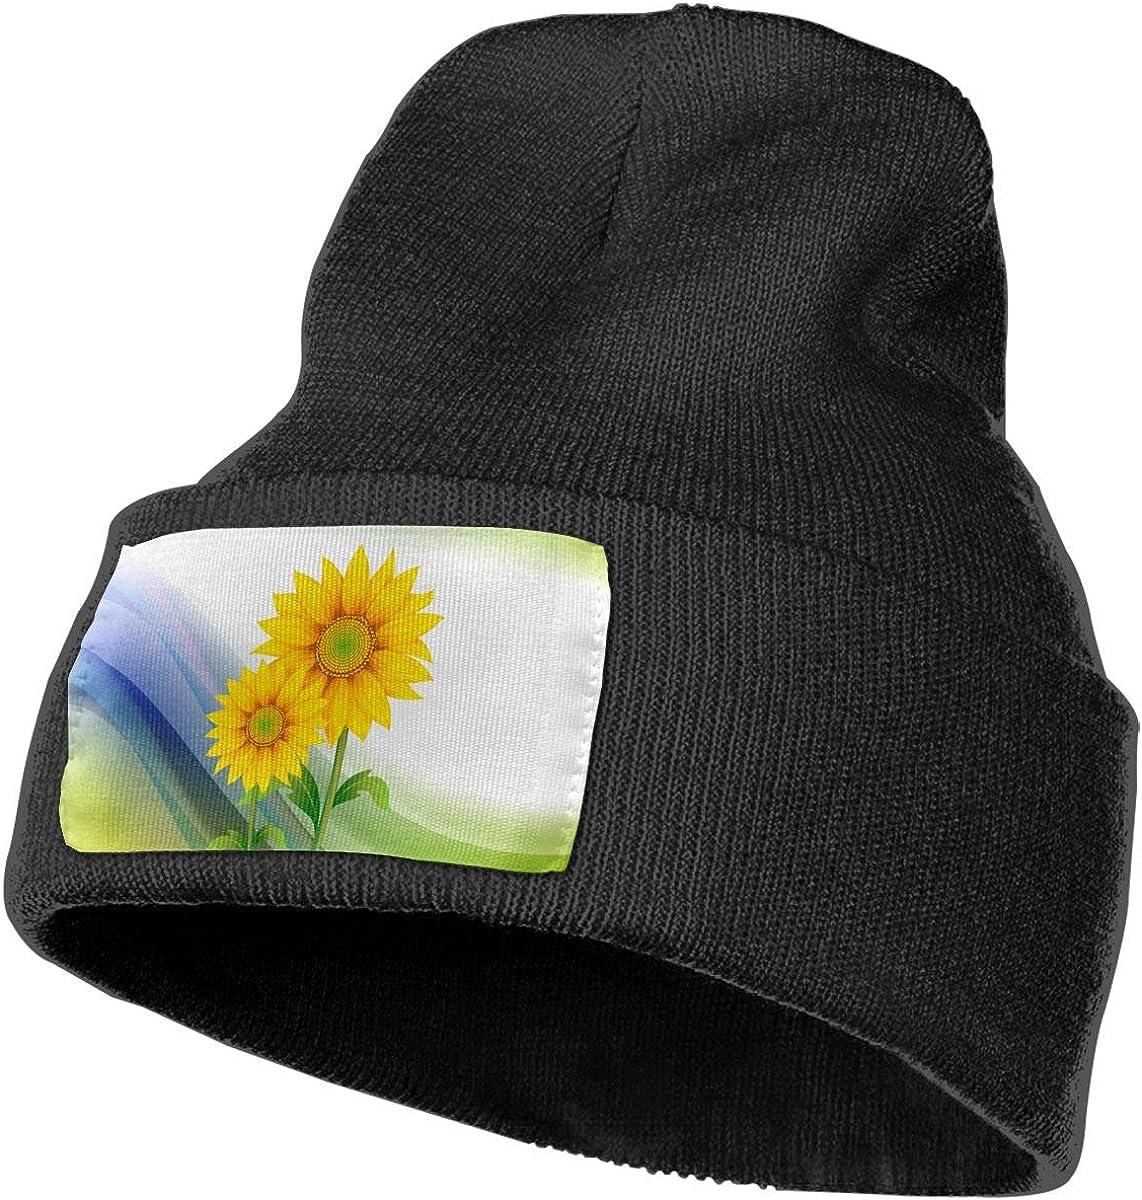 Beautiful Sunflower Men/&Women Warm Winter Knit Plain Beanie Hat Skull Cap Acrylic Knit Cuff Hat